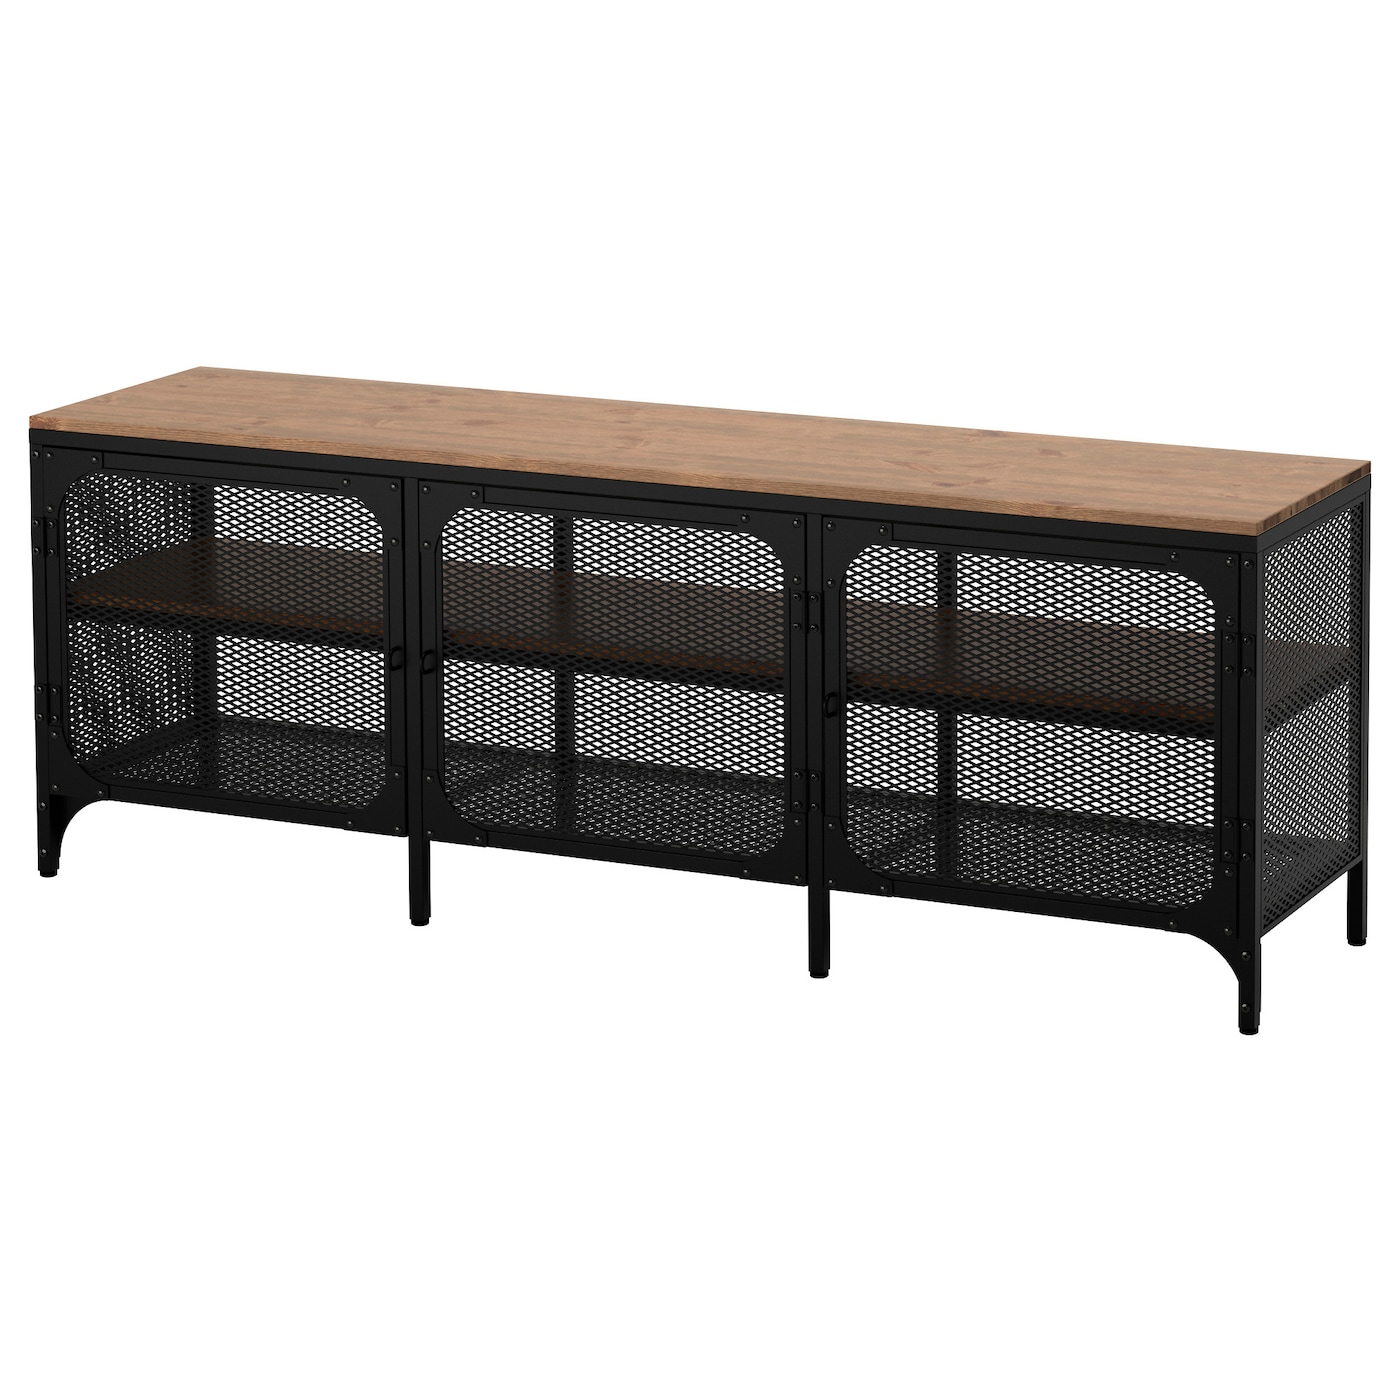 Smal Tv Meubel.Fjallbo Tv Unit Black 59x14 1 8x21 1 4 Ikea